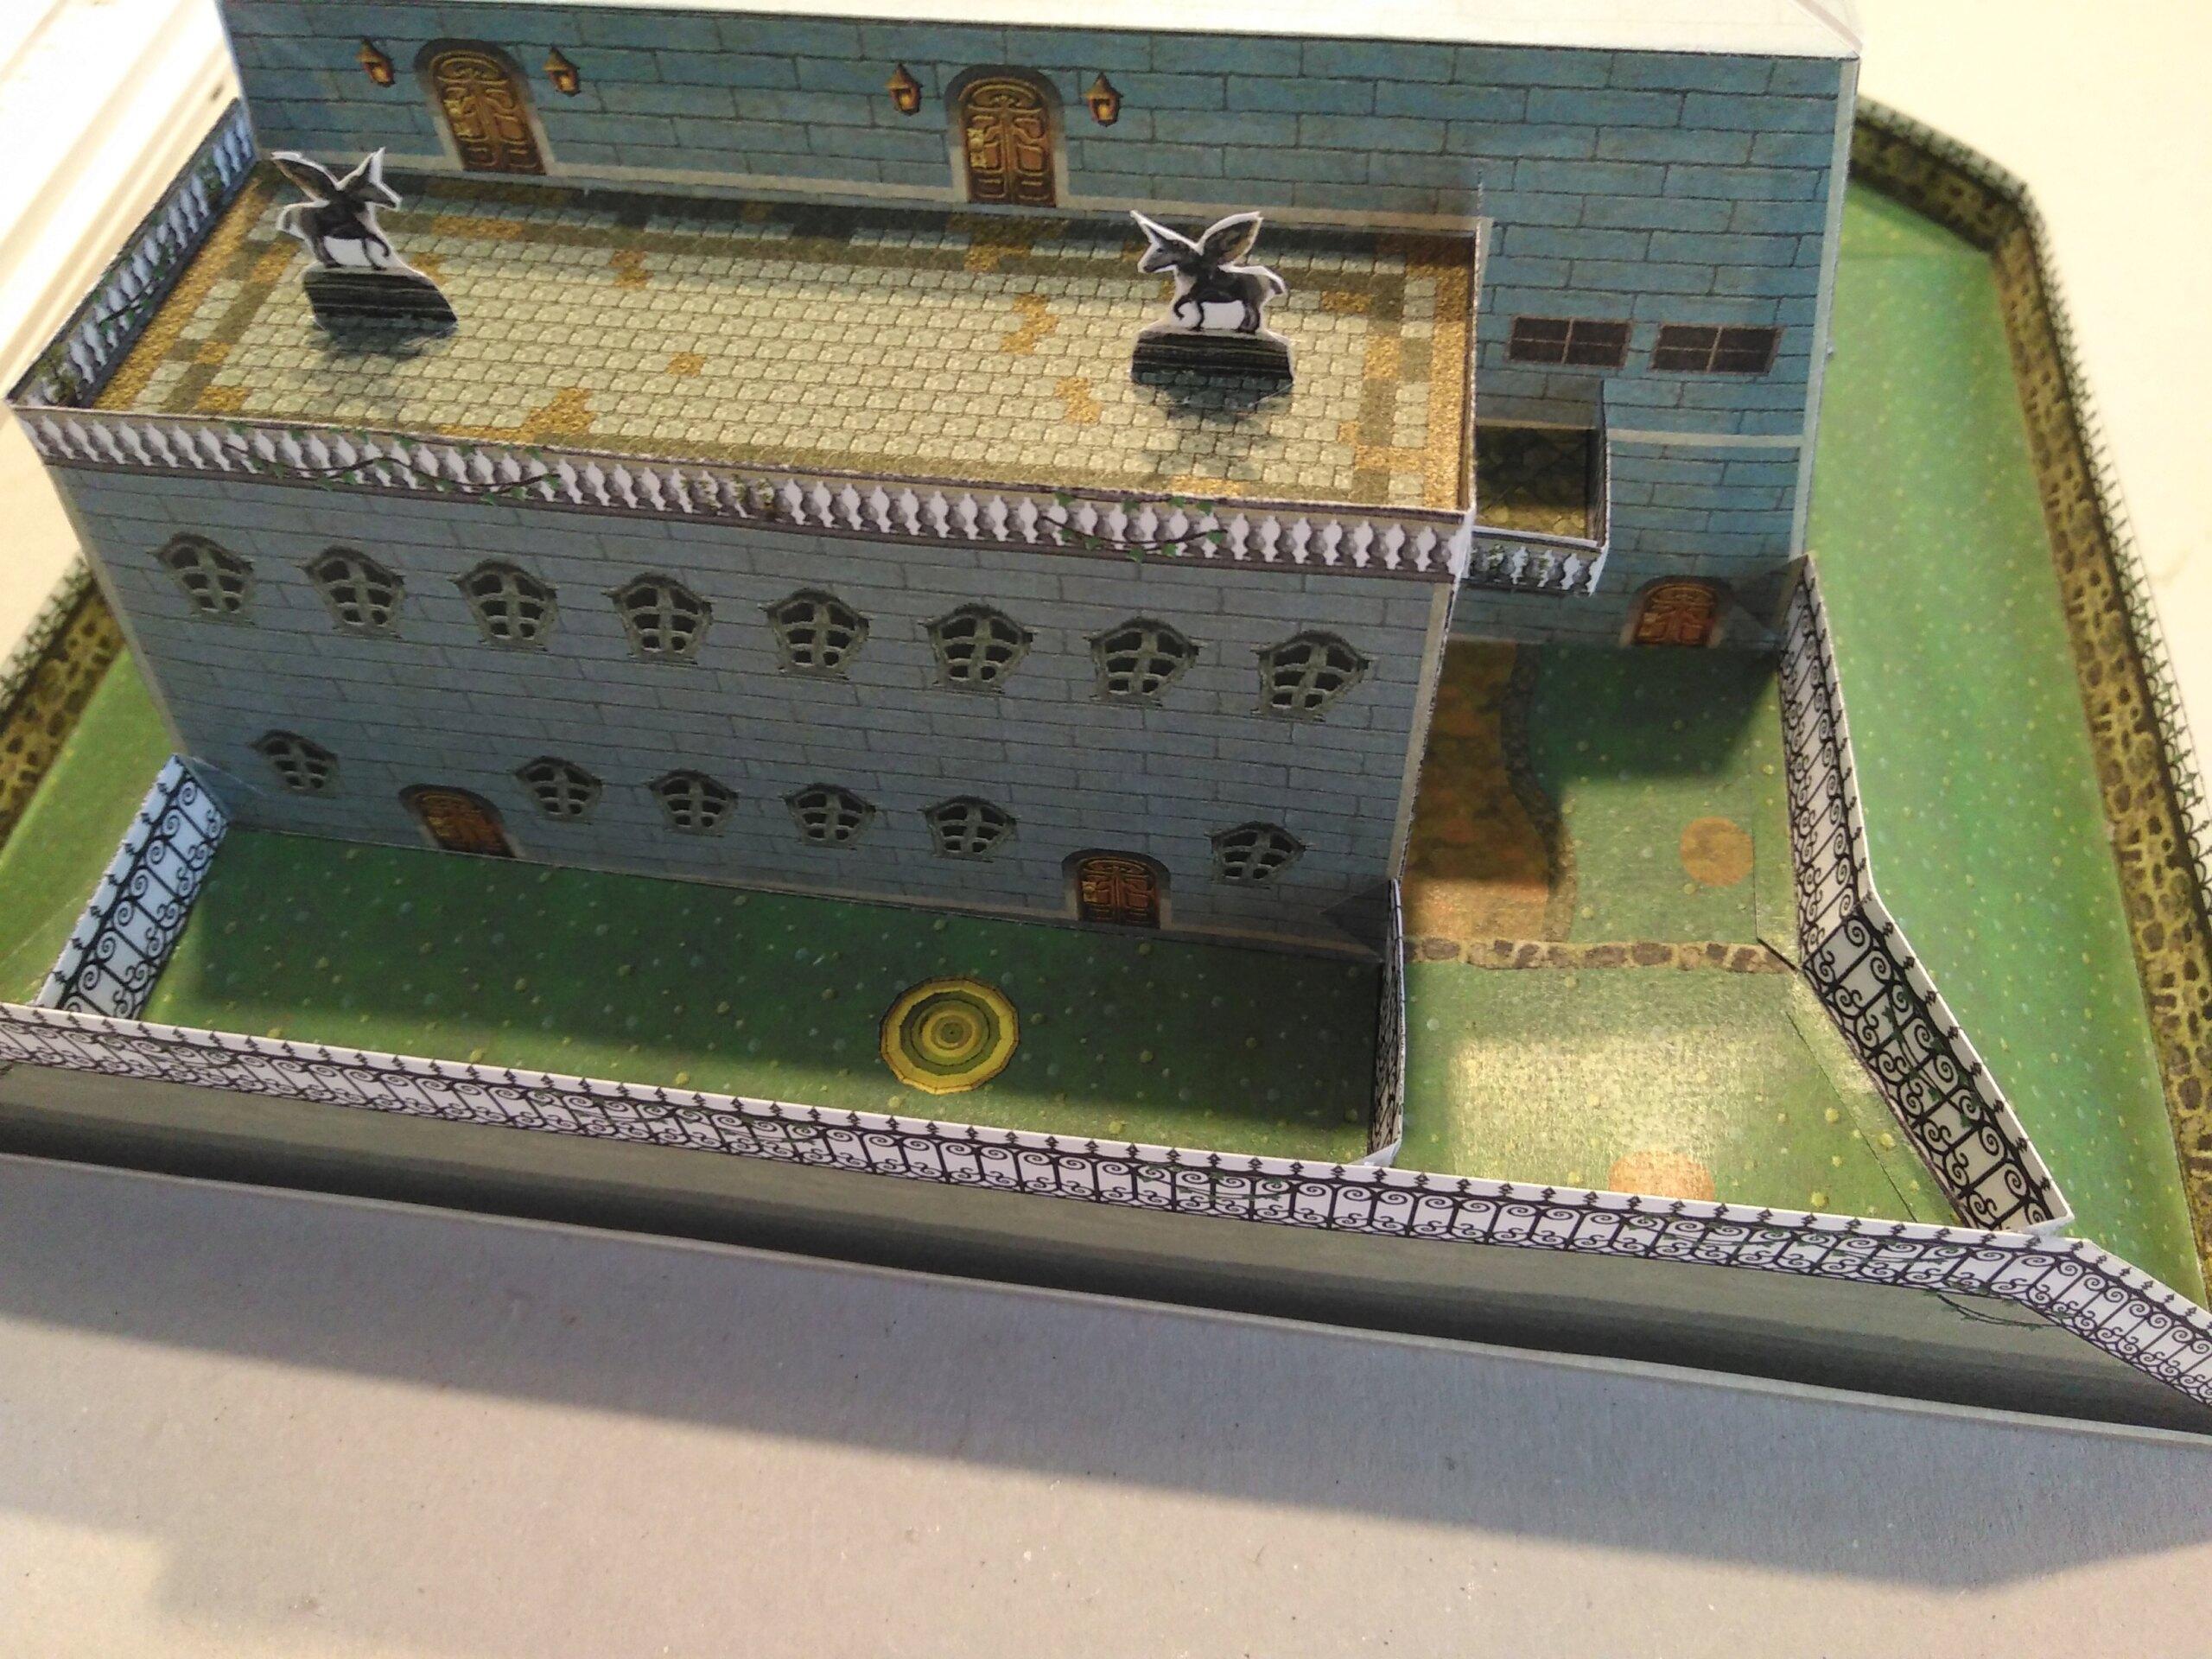 Luigi's Mansion - Die Gruselvilla aus dem Gamecube-Klassiker Img_2029